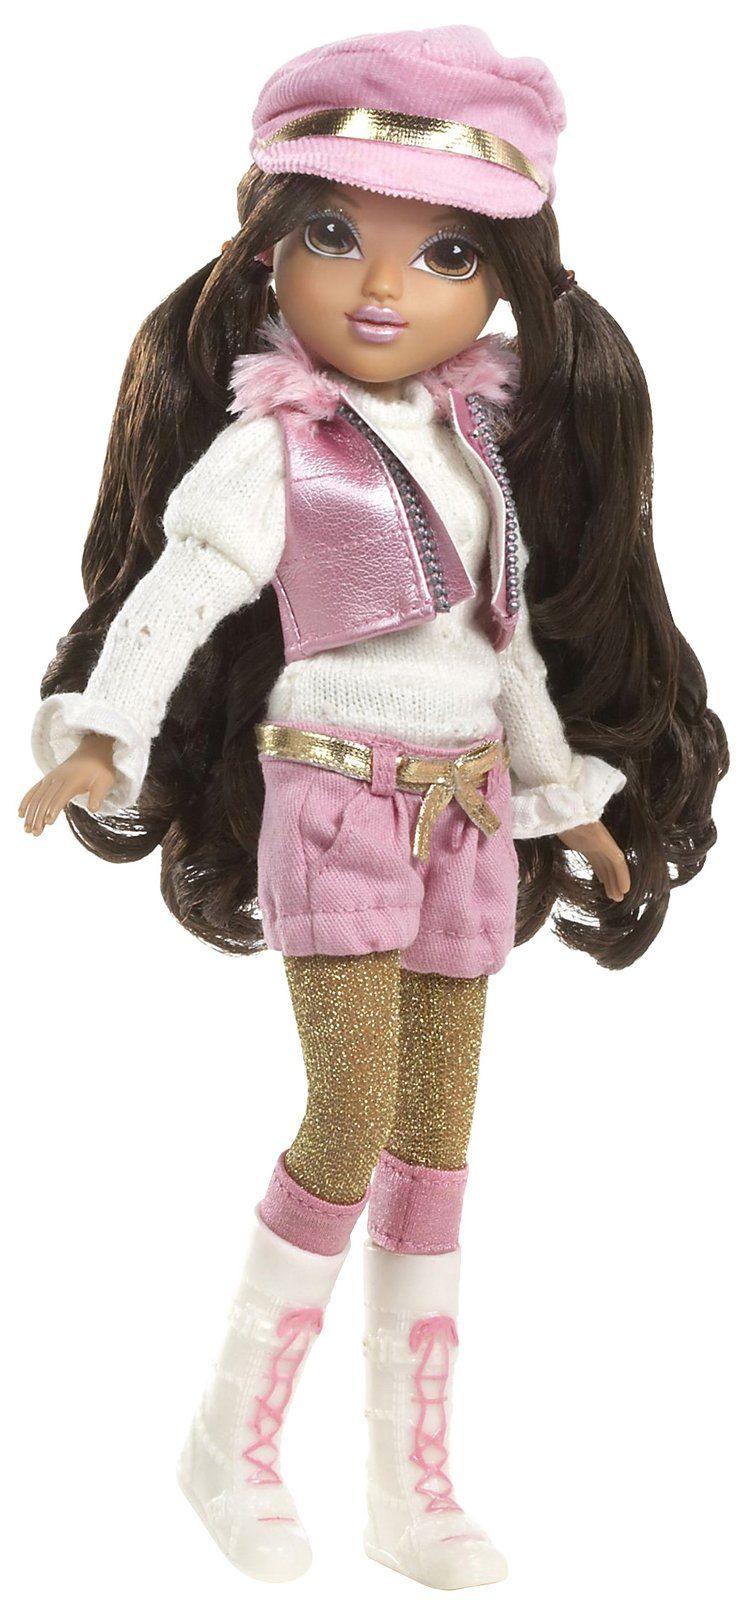 Moxie girlz magic snow doll sophina free shipping - Moxie girlz pagine da colorare ...